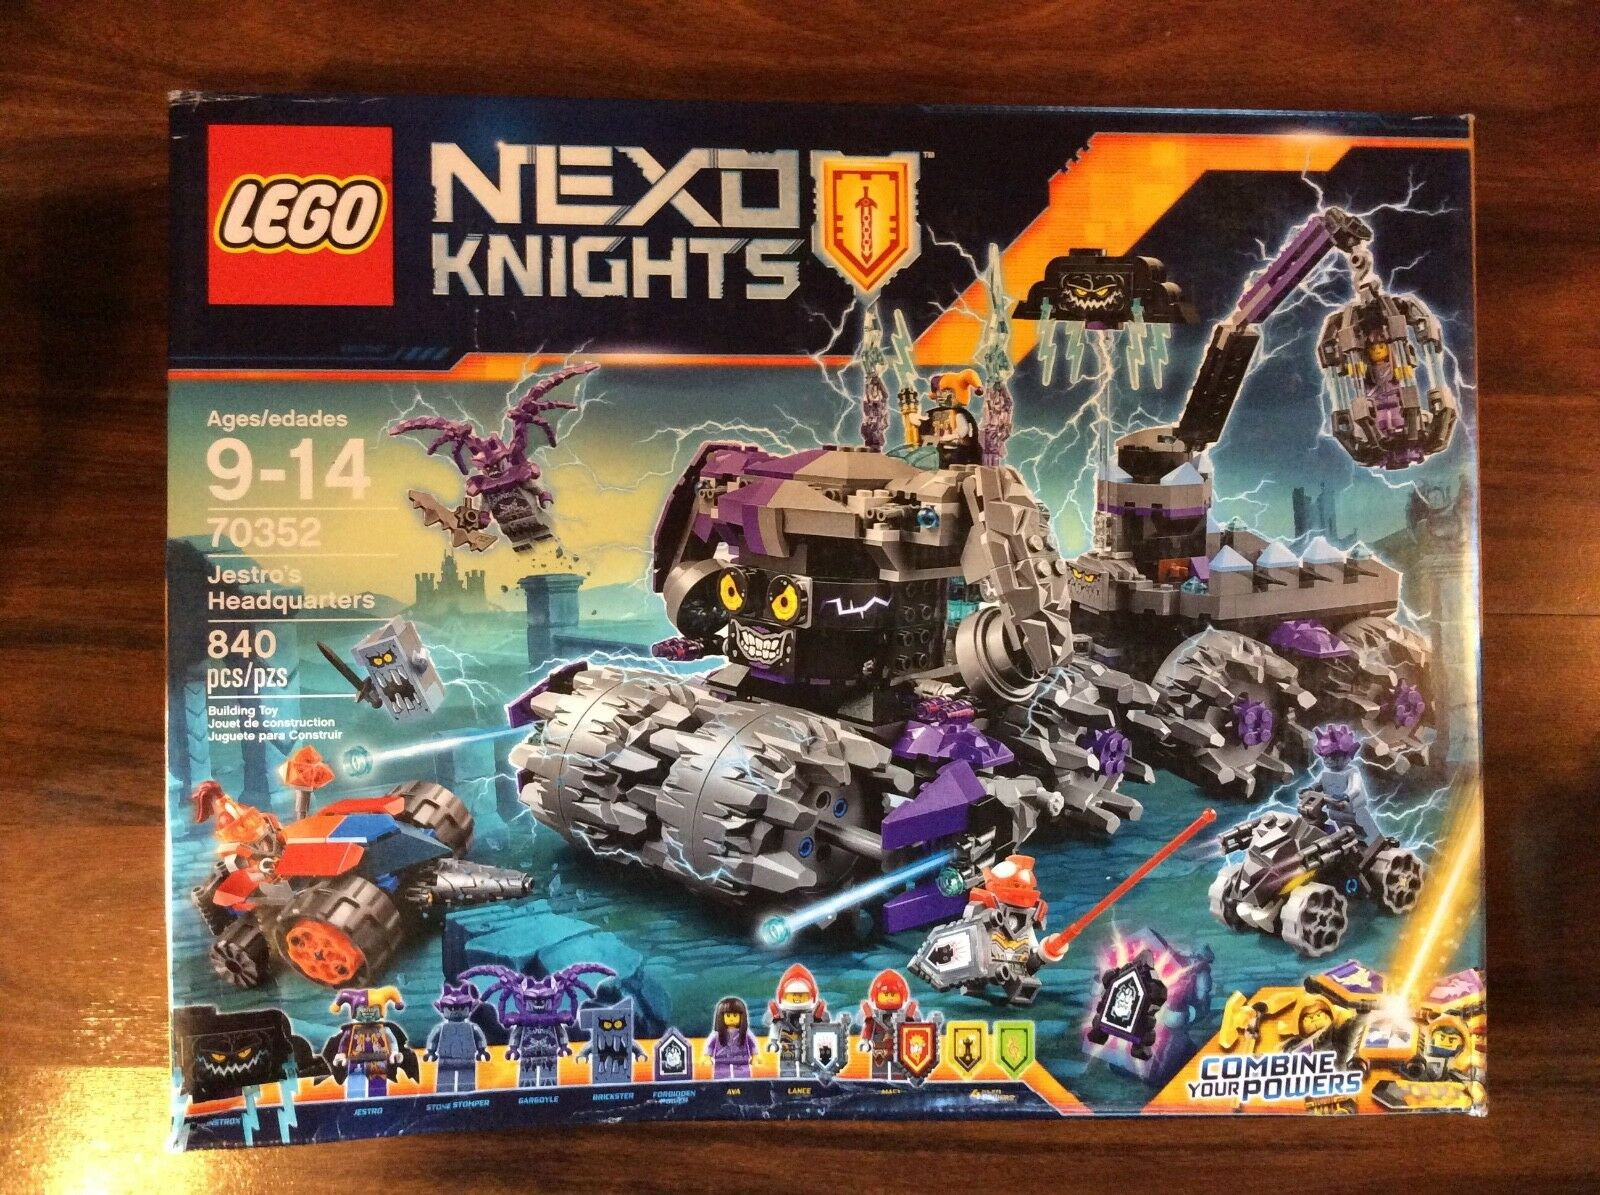 New Lego Nexo Knights Jestro's Headquarters Set 70352 in Sealed Damaged Box